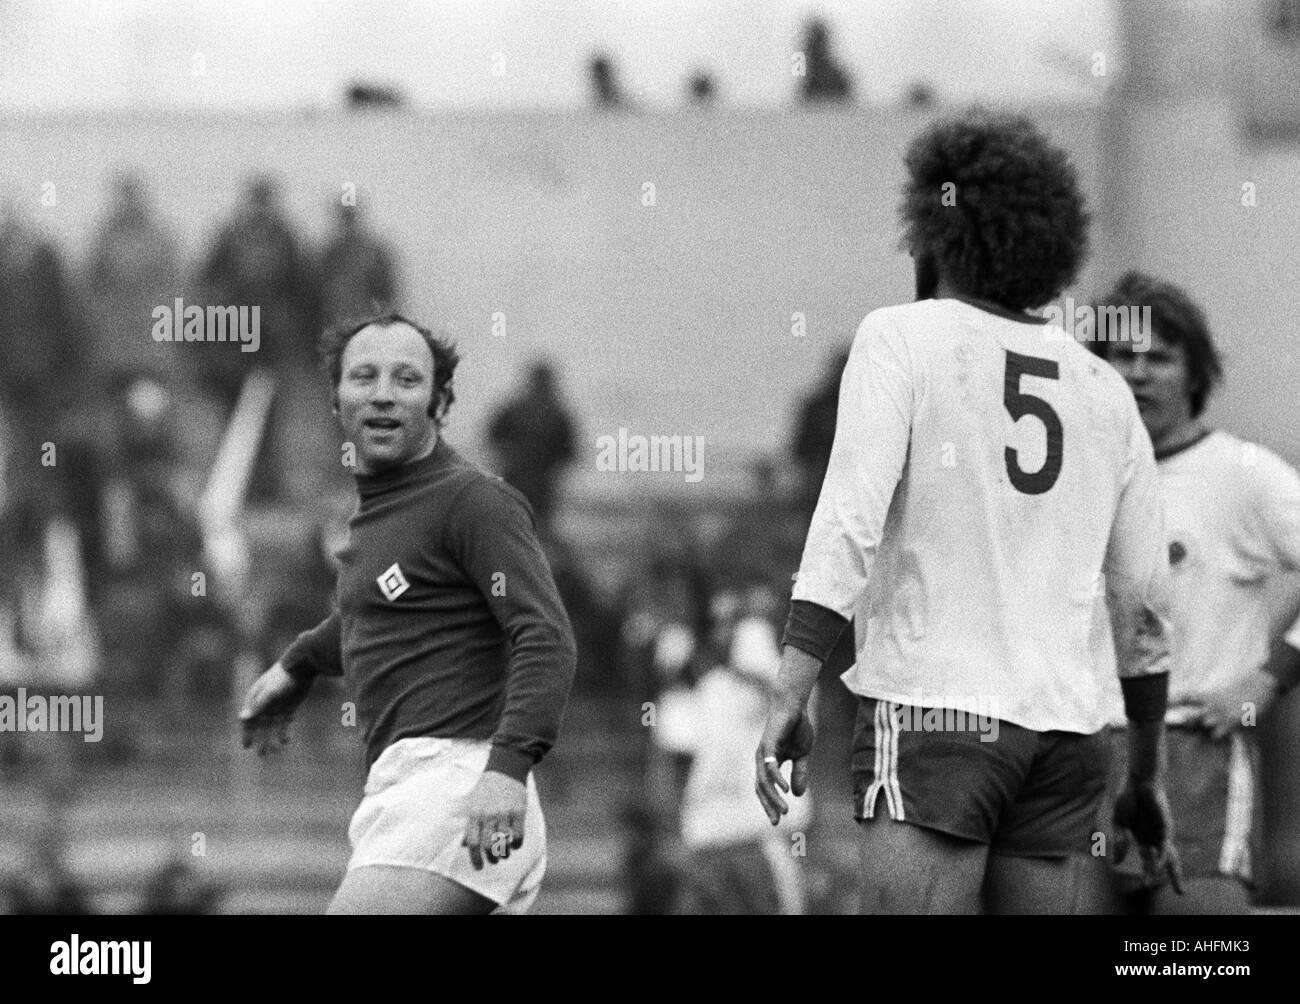 football, Bundesliga, 1971/1972, Rot-Weiss Oberhausen versus Hamburger SV 1:0, Niederrhein Stadium in Oberhausen, scene of the match, f.l.t.r. Uwe Seeler (HSV), Uwe Kliemann (RWO, 5), Lothar Kobluhn (RWO) - Stock Image